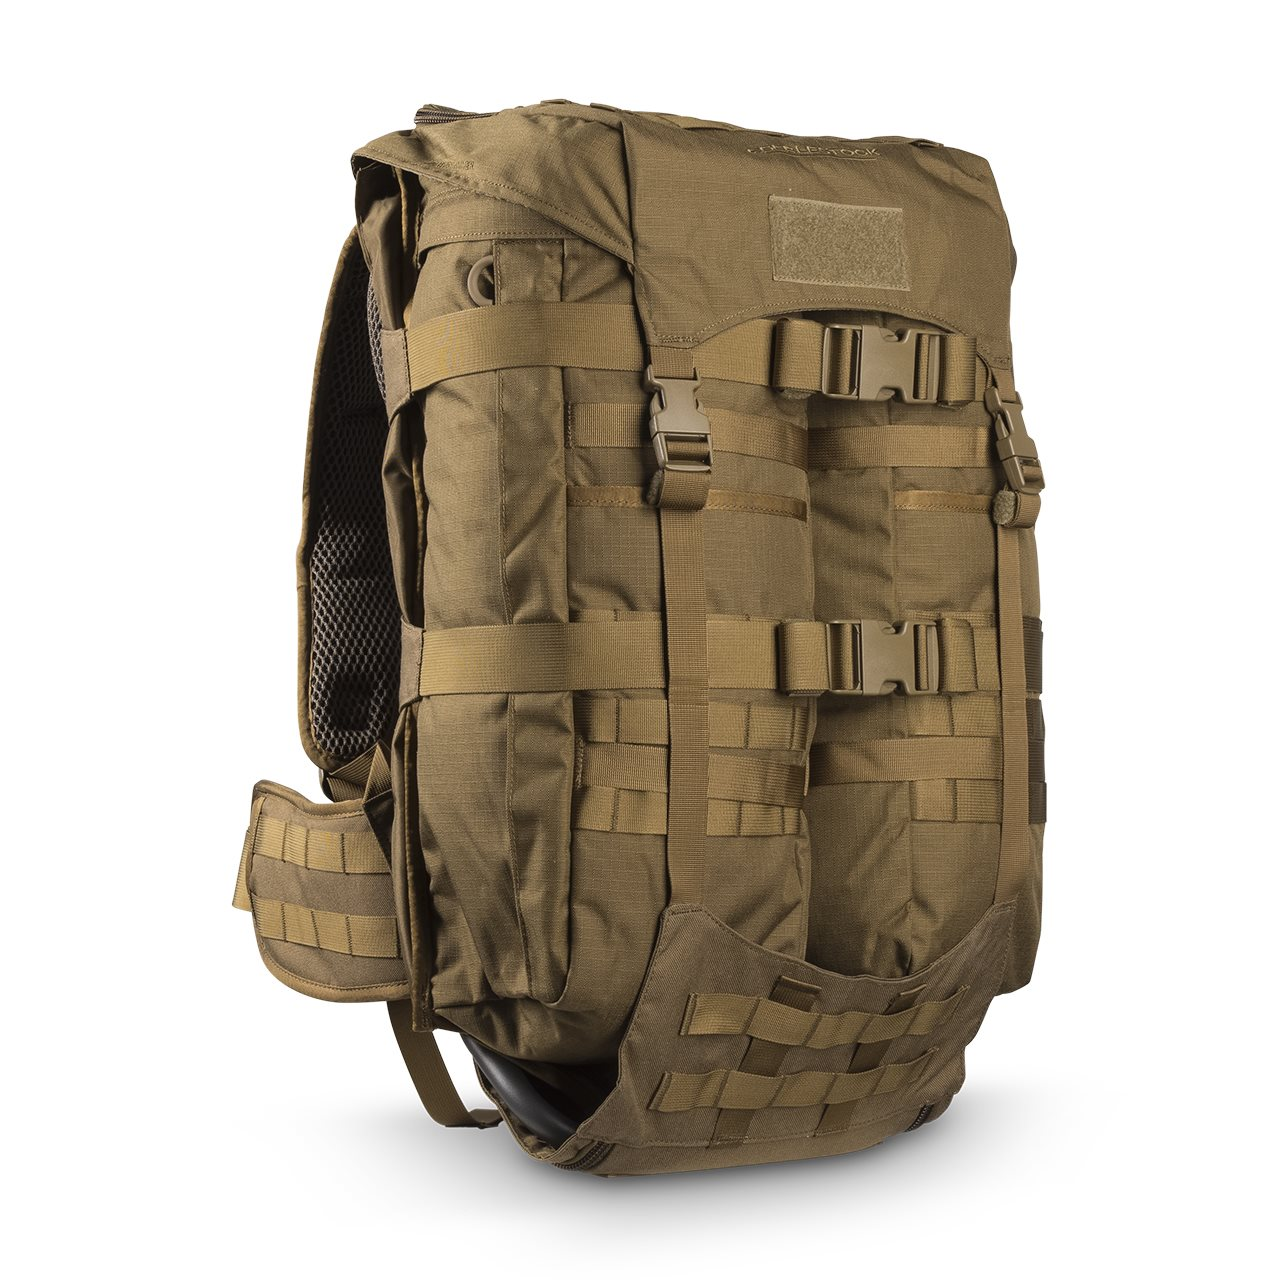 J51 WARHAMMER Backpack COYOTE BROWN EBERLESTOCK J51MC L-11